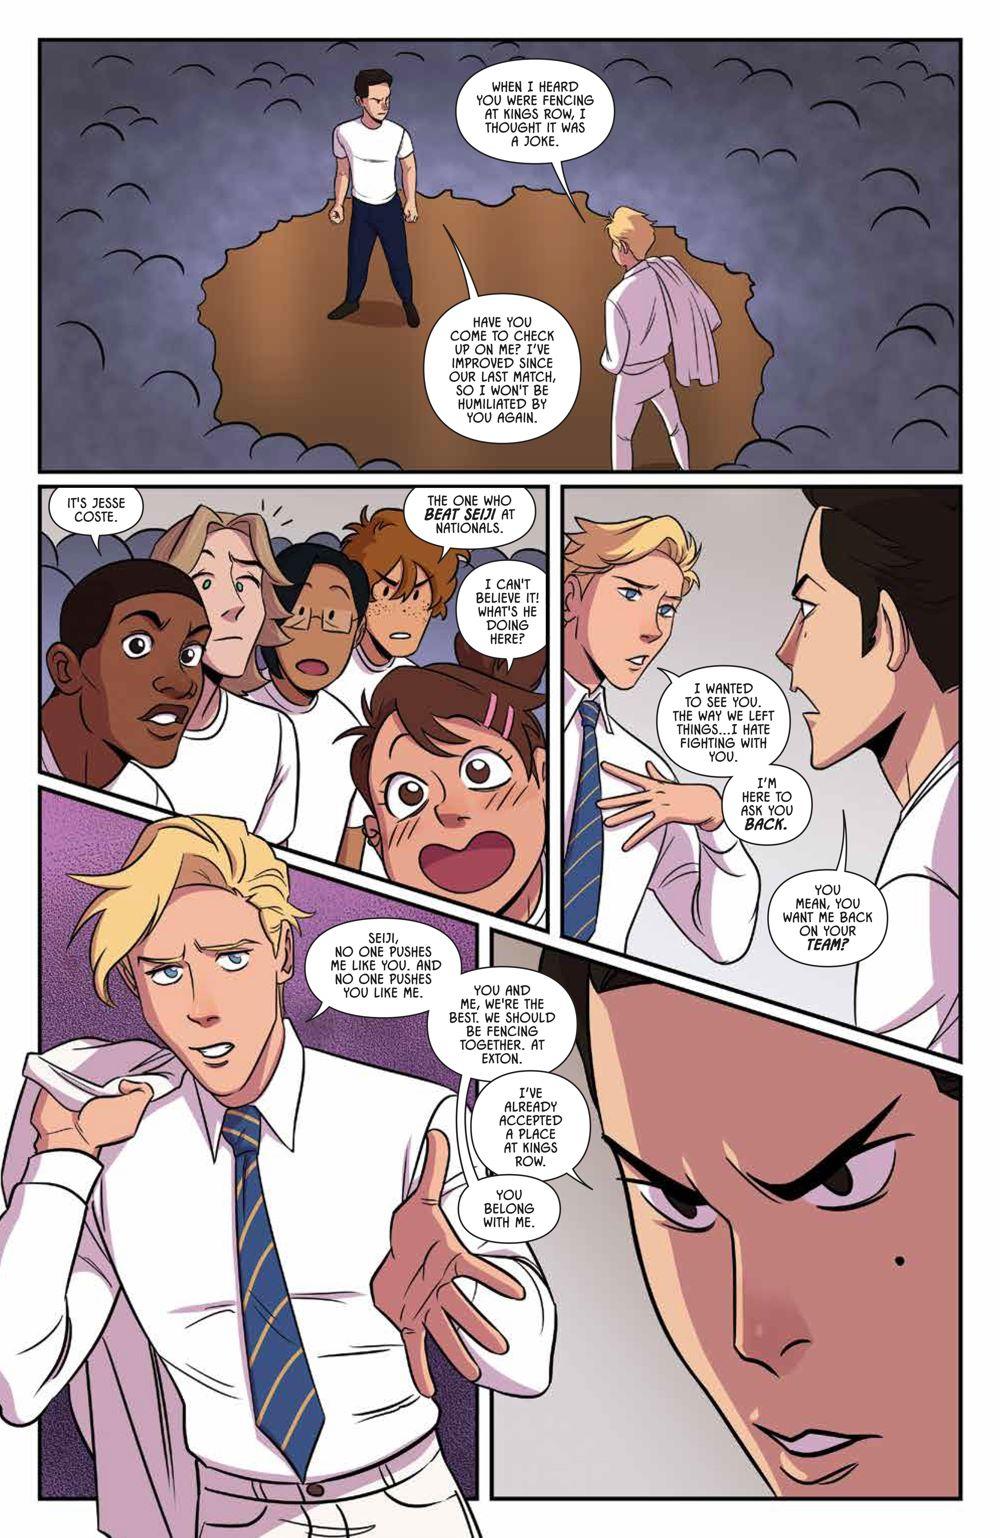 Fence_OGN_Rivals_SC_PRESS_9-1 ComicList Previews: FENCE RIVALS GN